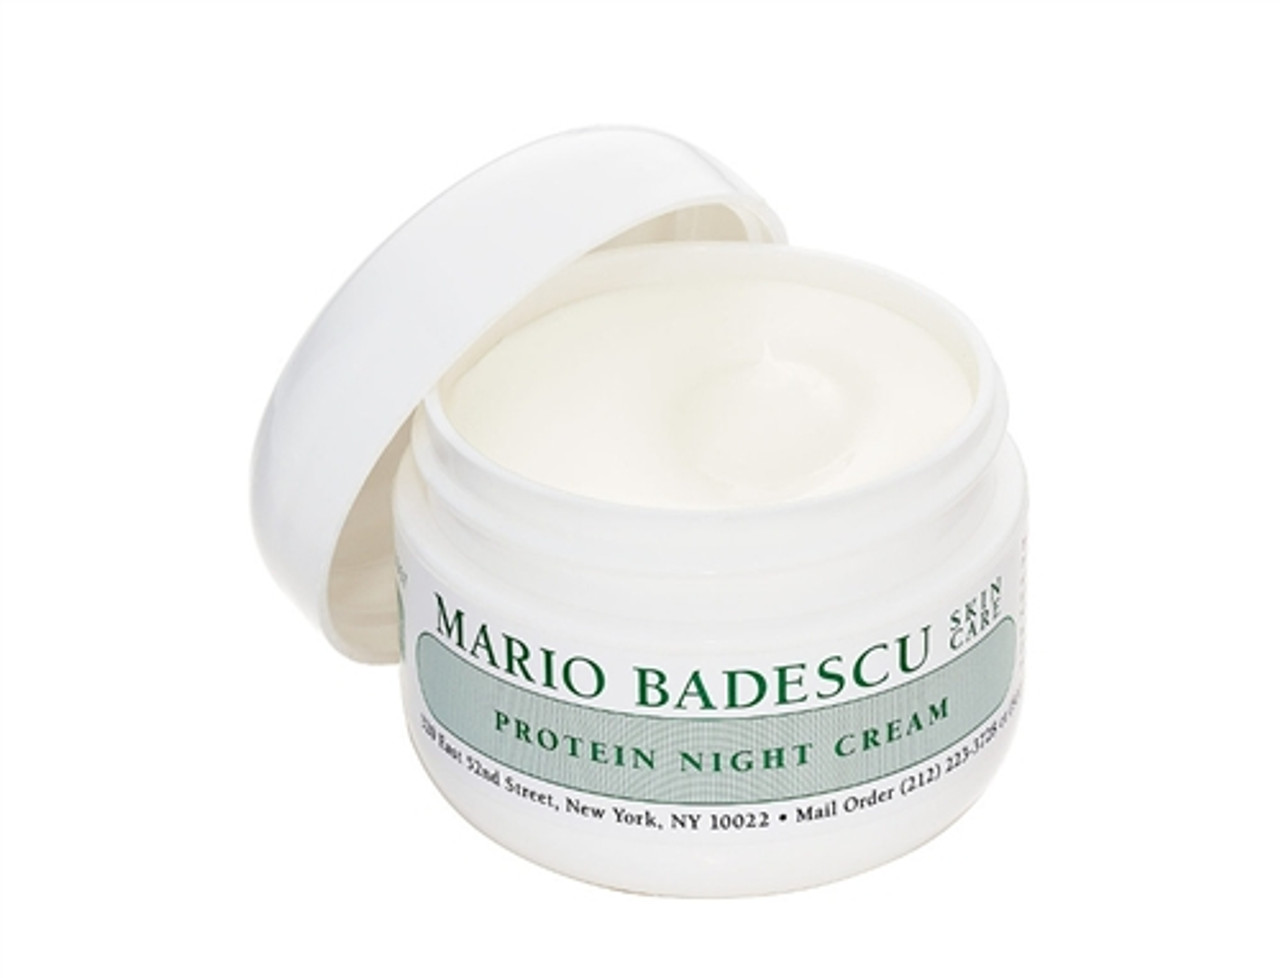 Mario Badescu Protein Night Cream - 1 OZ